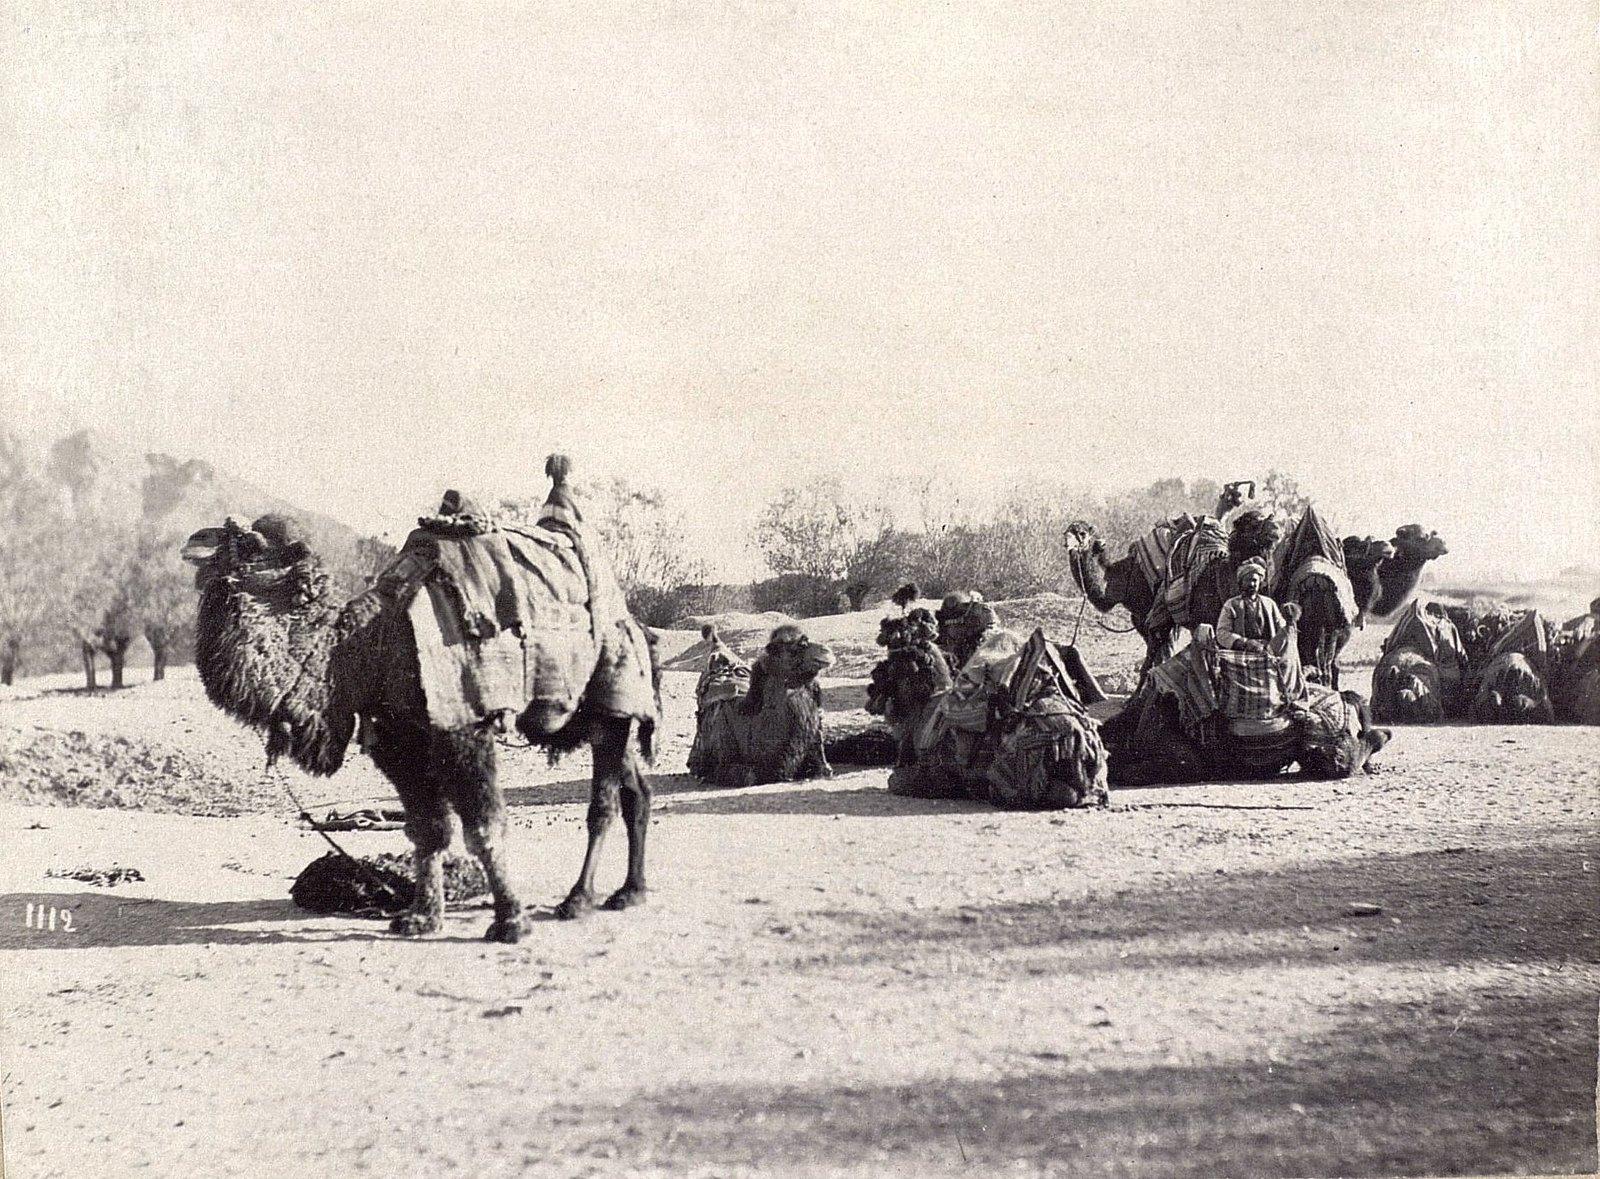 Караван верблюдов на отдыхе